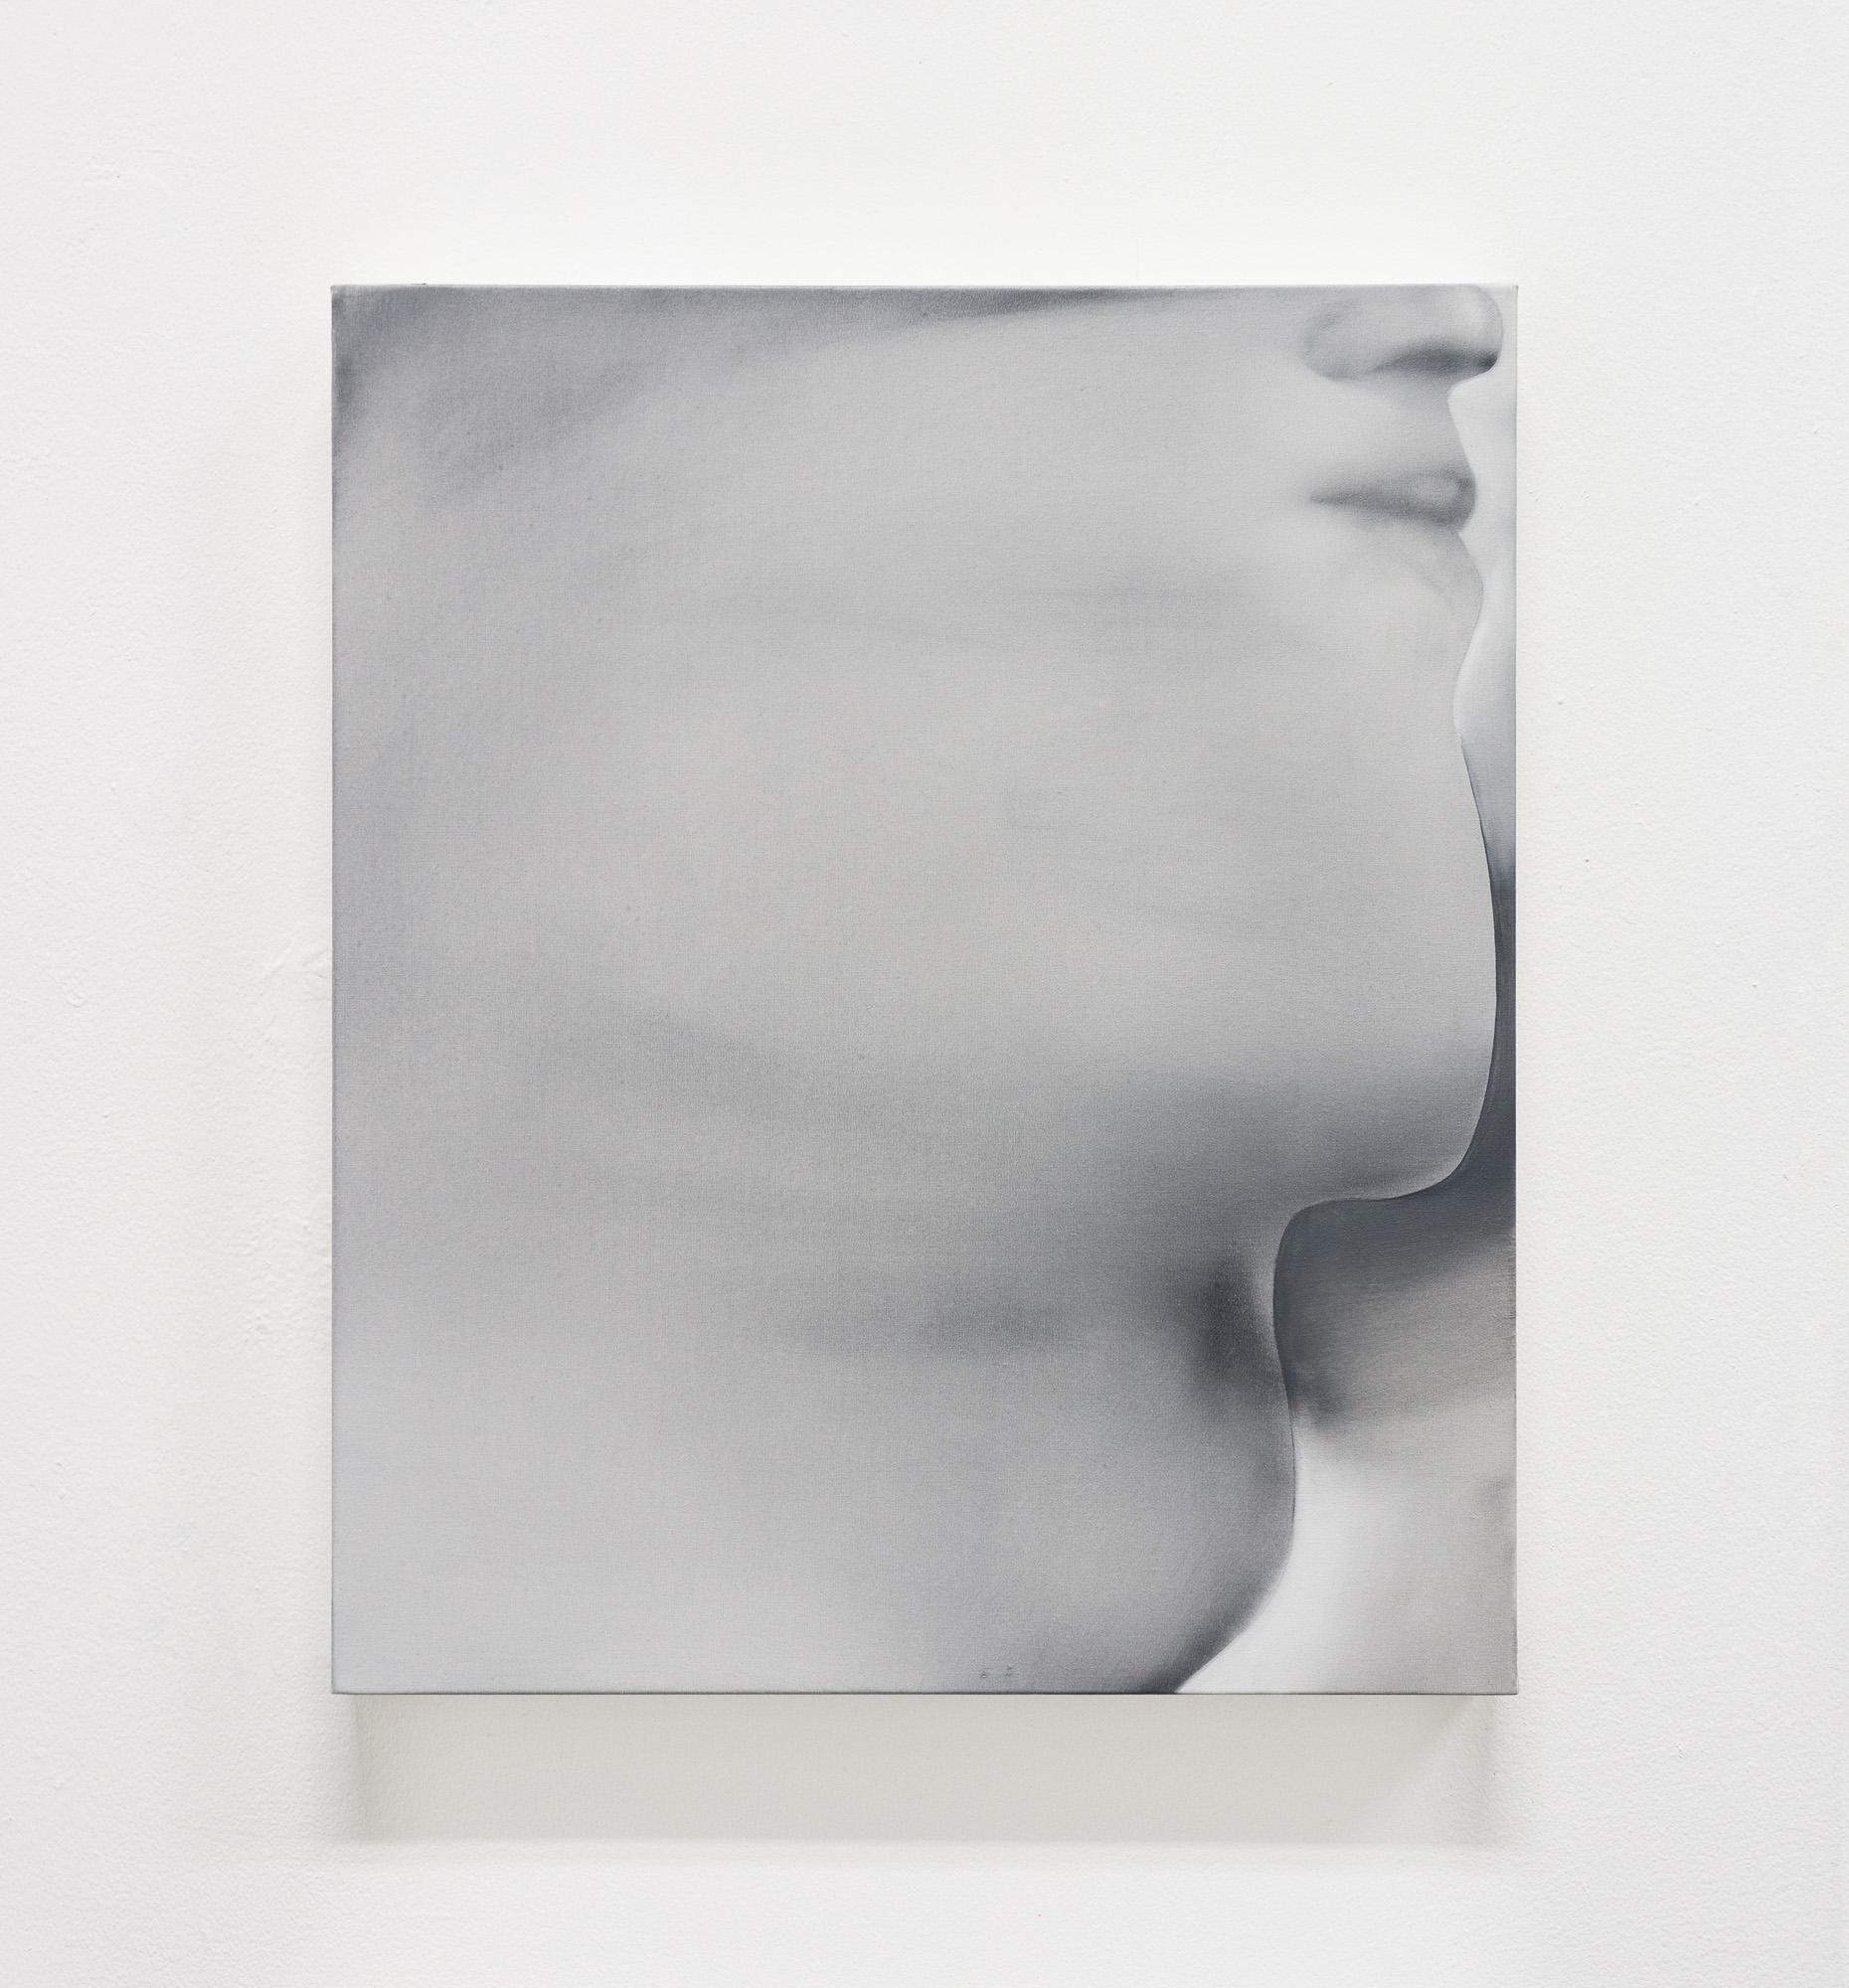 Jingze Du. <em>Under the Peach Tree</em>, 2020. Oil on linen, 23 5/8 x 19 5/8 inches (60 x 50 cm)